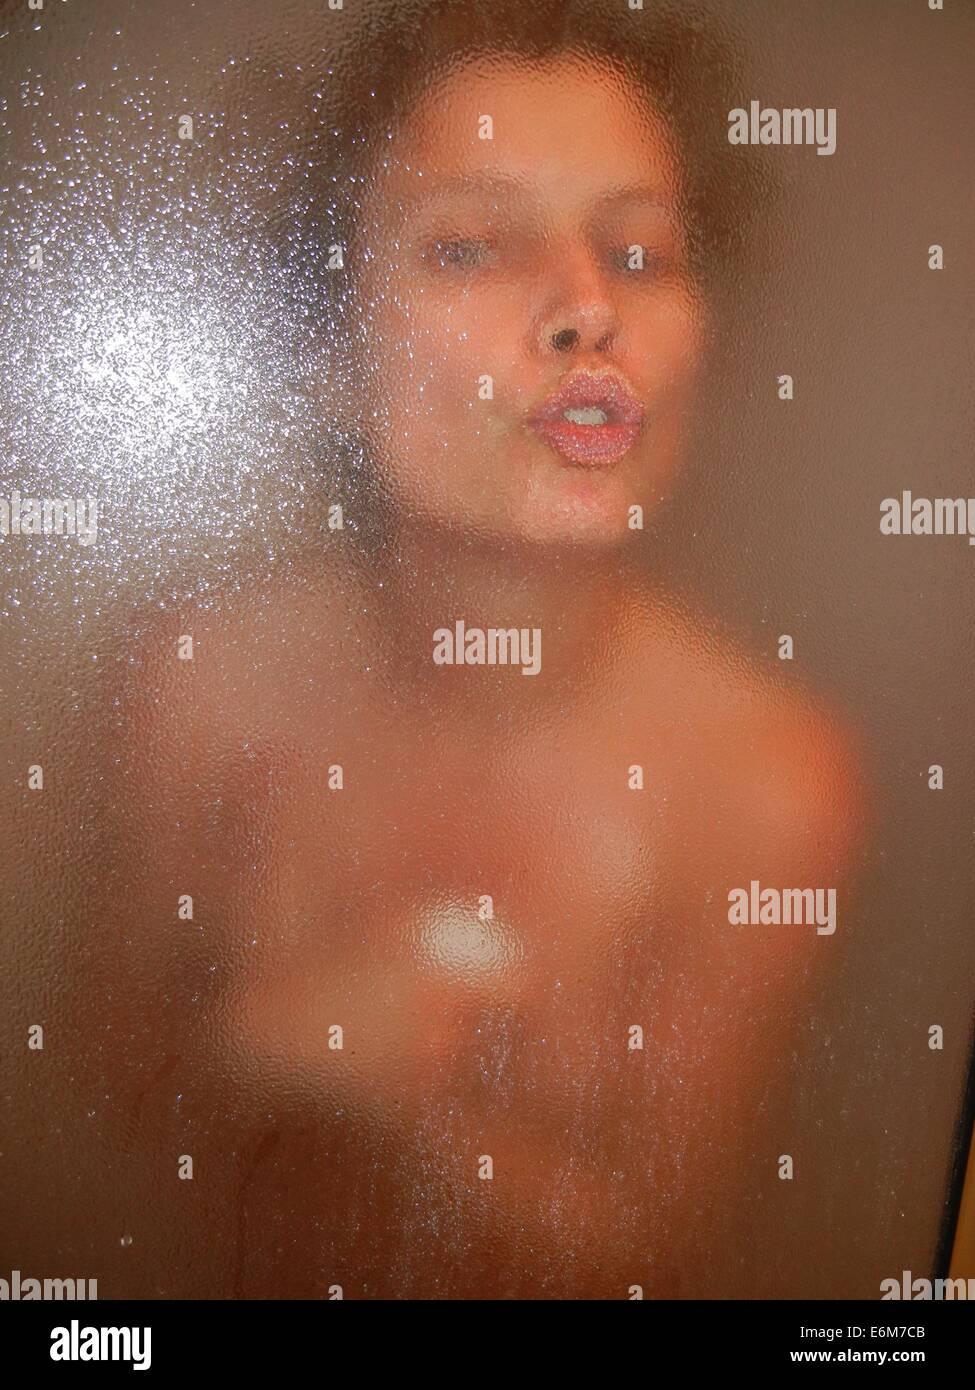 Woman Shower Kiss Erotic Girl Lips Hot Sexy Stock Photo 72974283